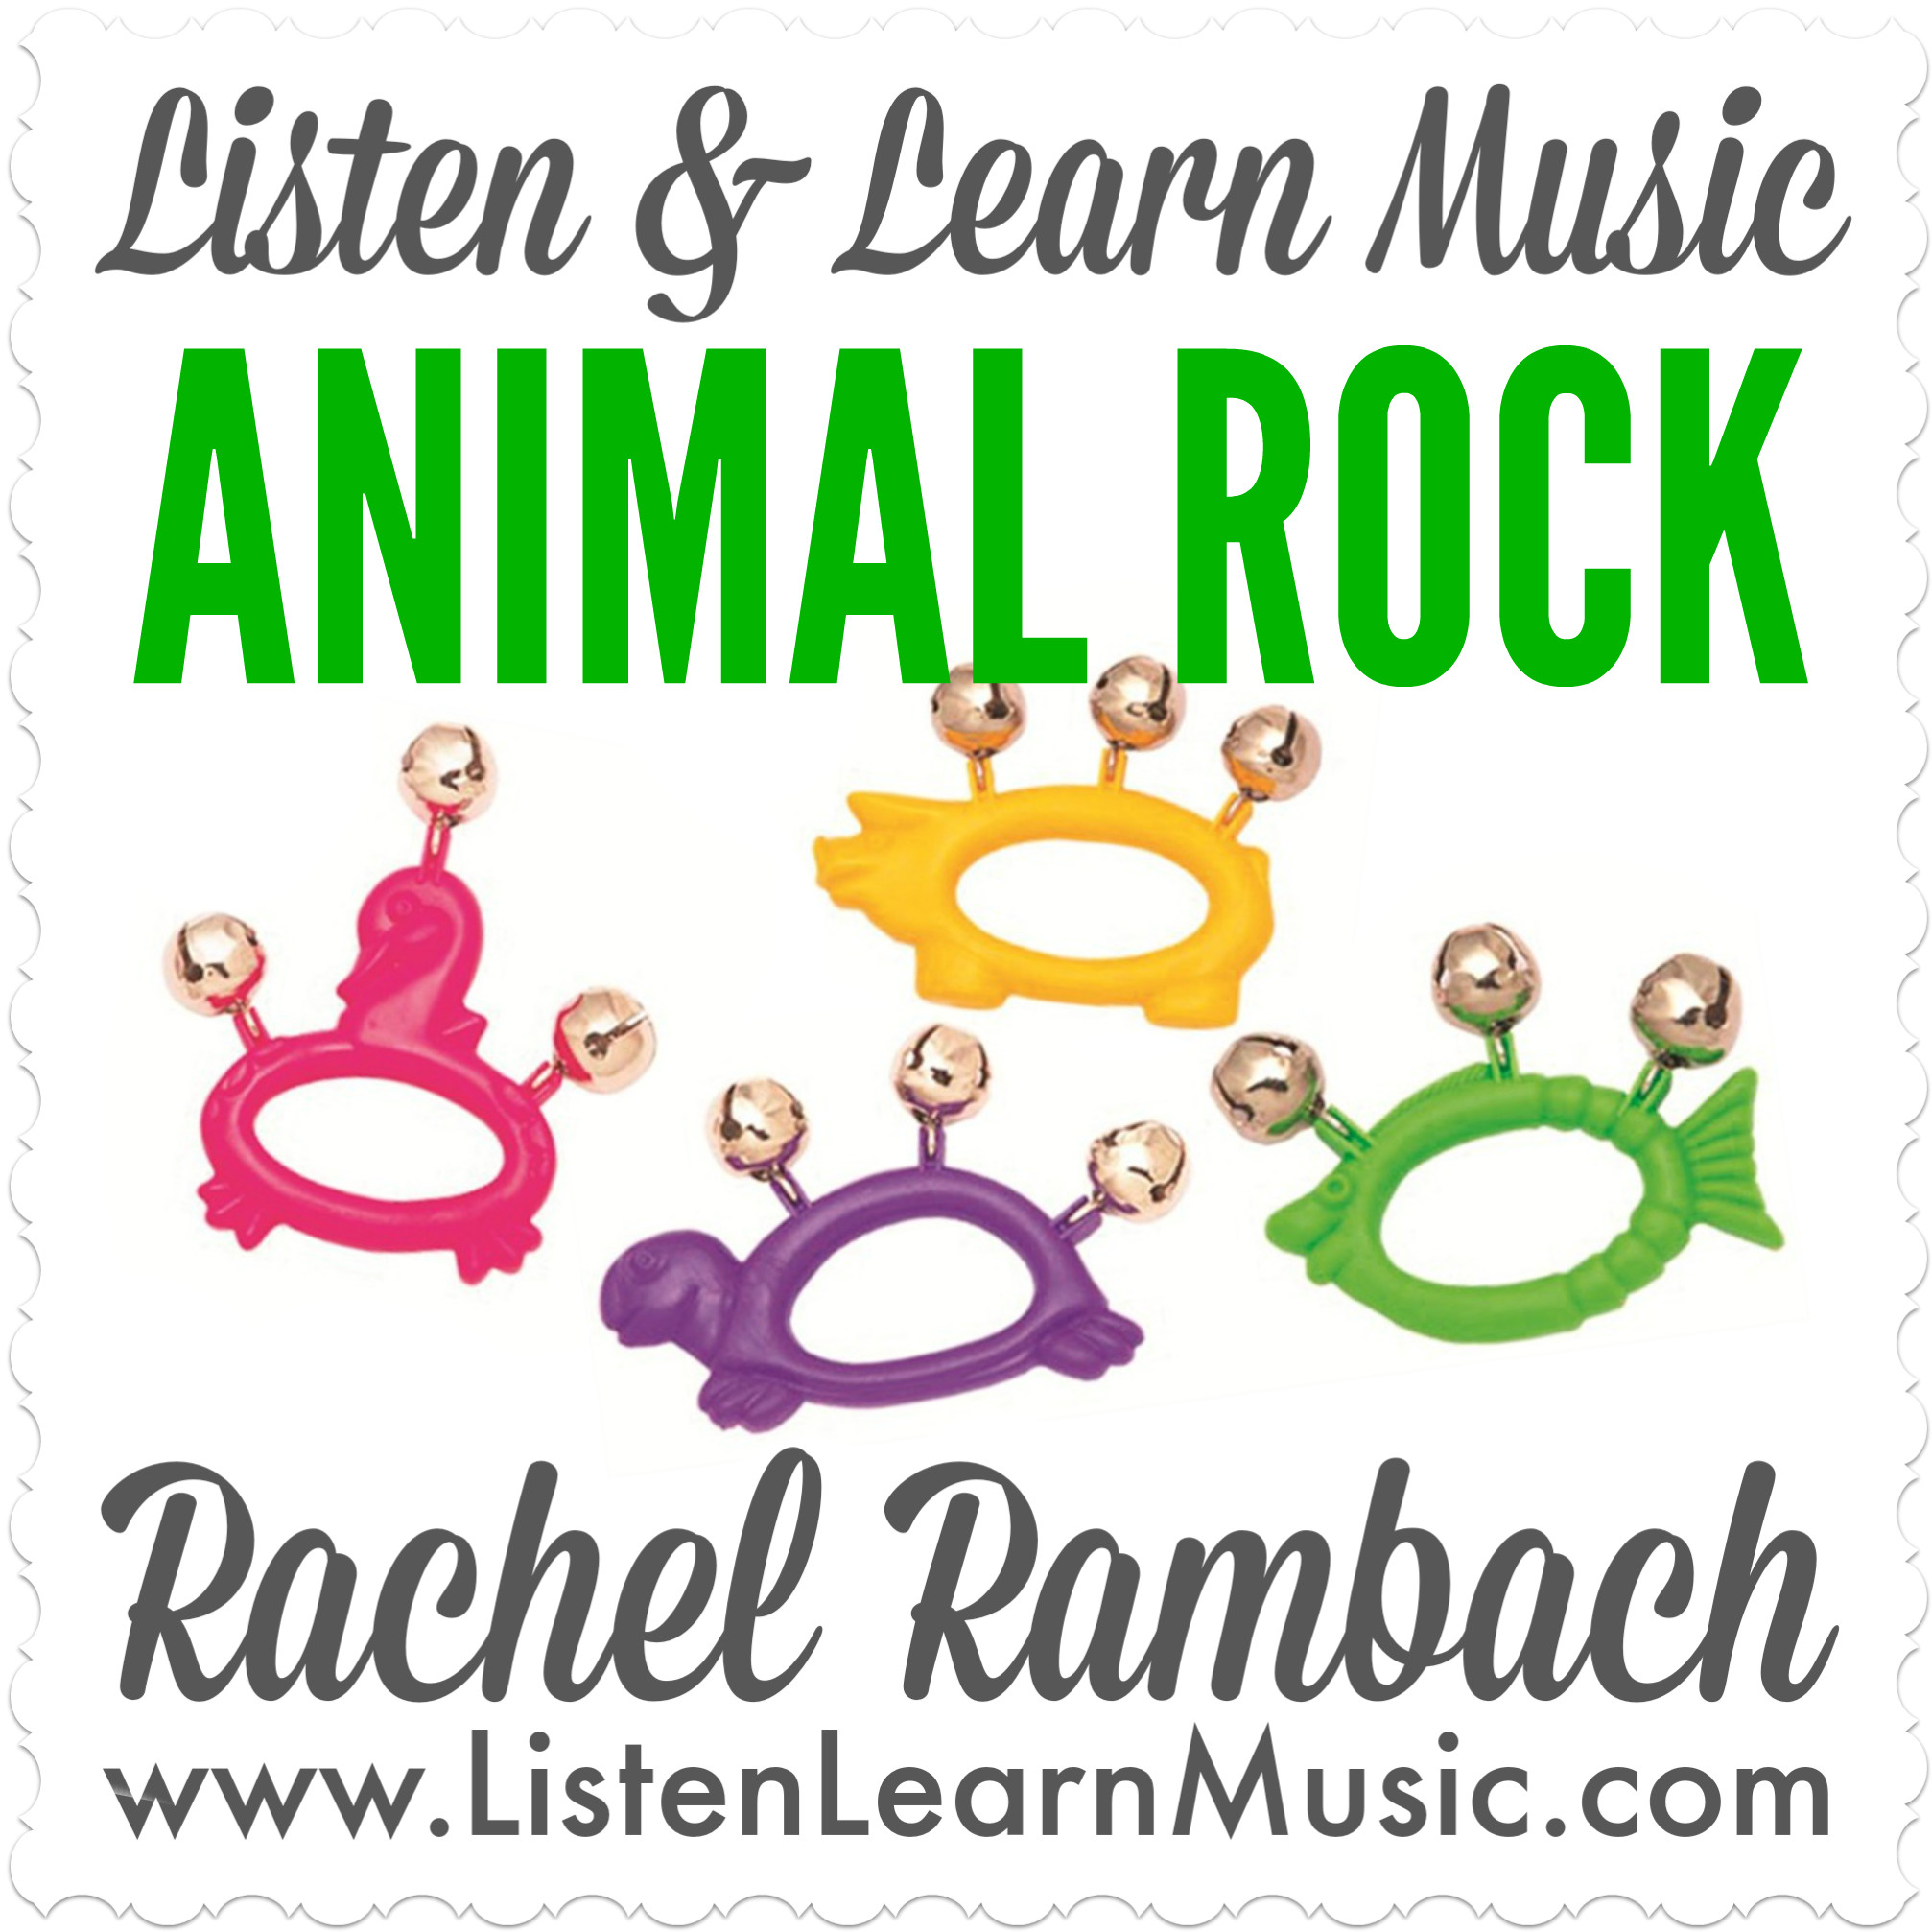 Animal Rock | Listen & Learn Music